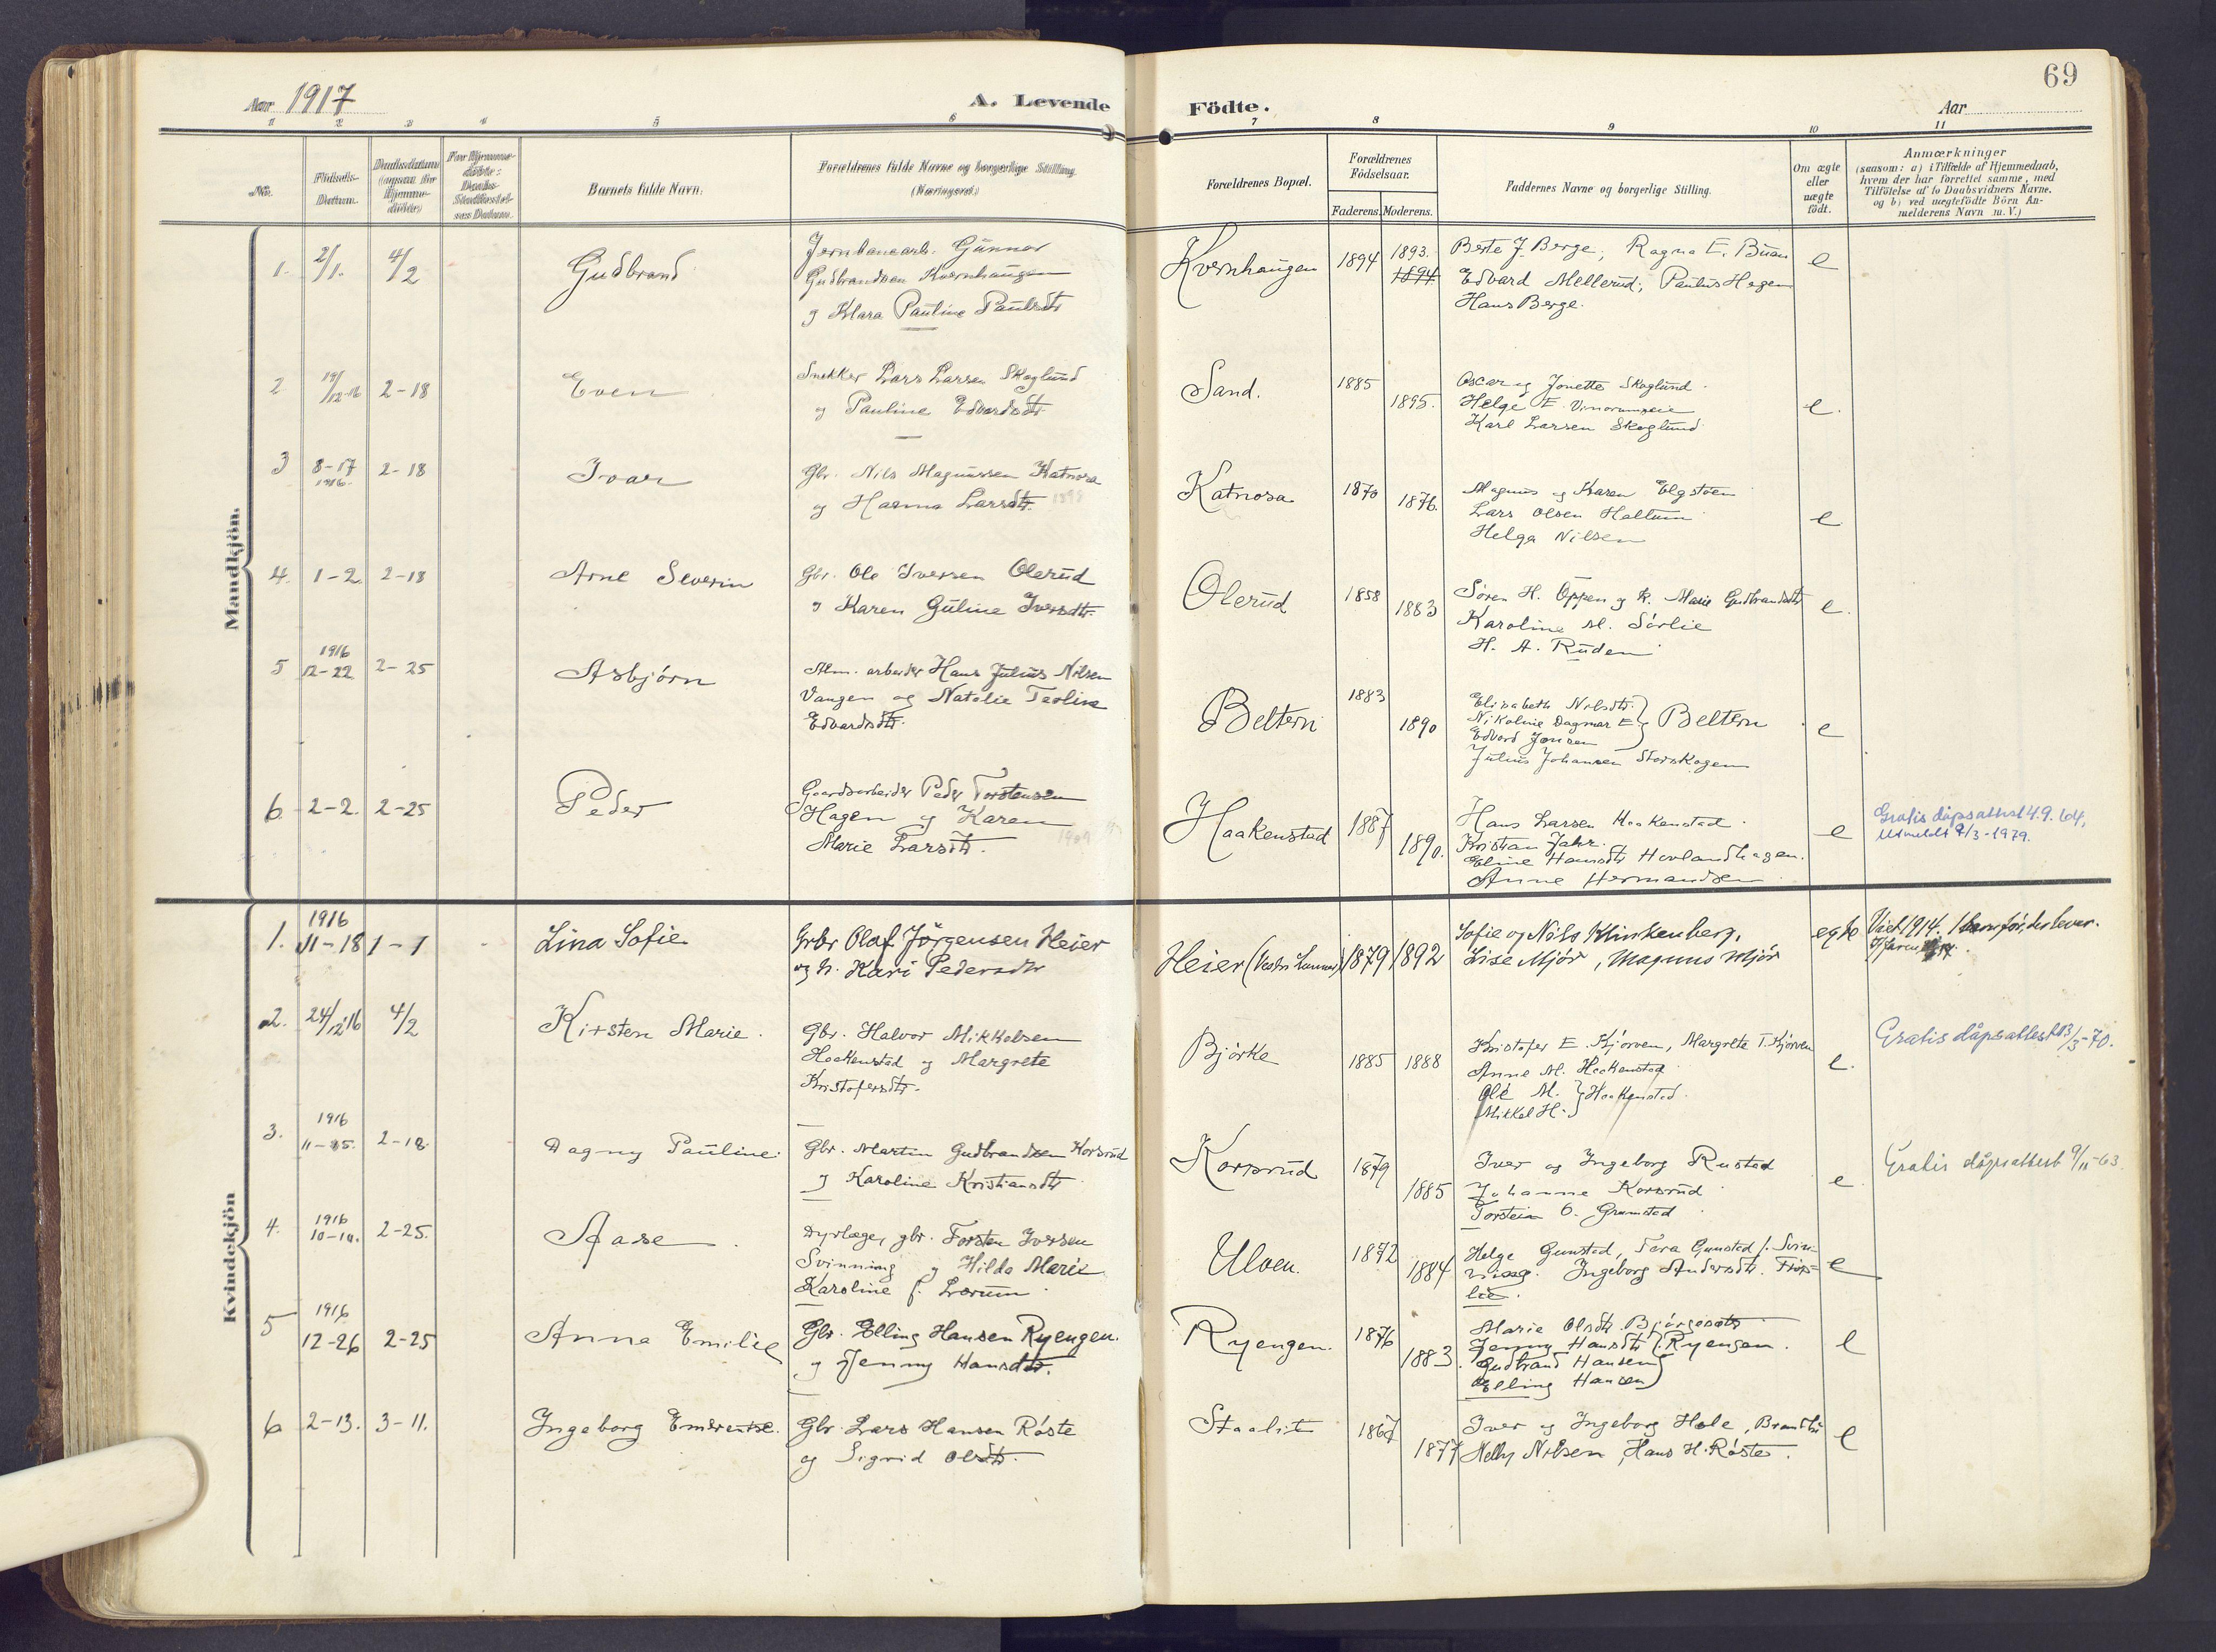 SAH, Lunner prestekontor, H/Ha/Haa/L0001: Ministerialbok nr. 1, 1907-1922, s. 69